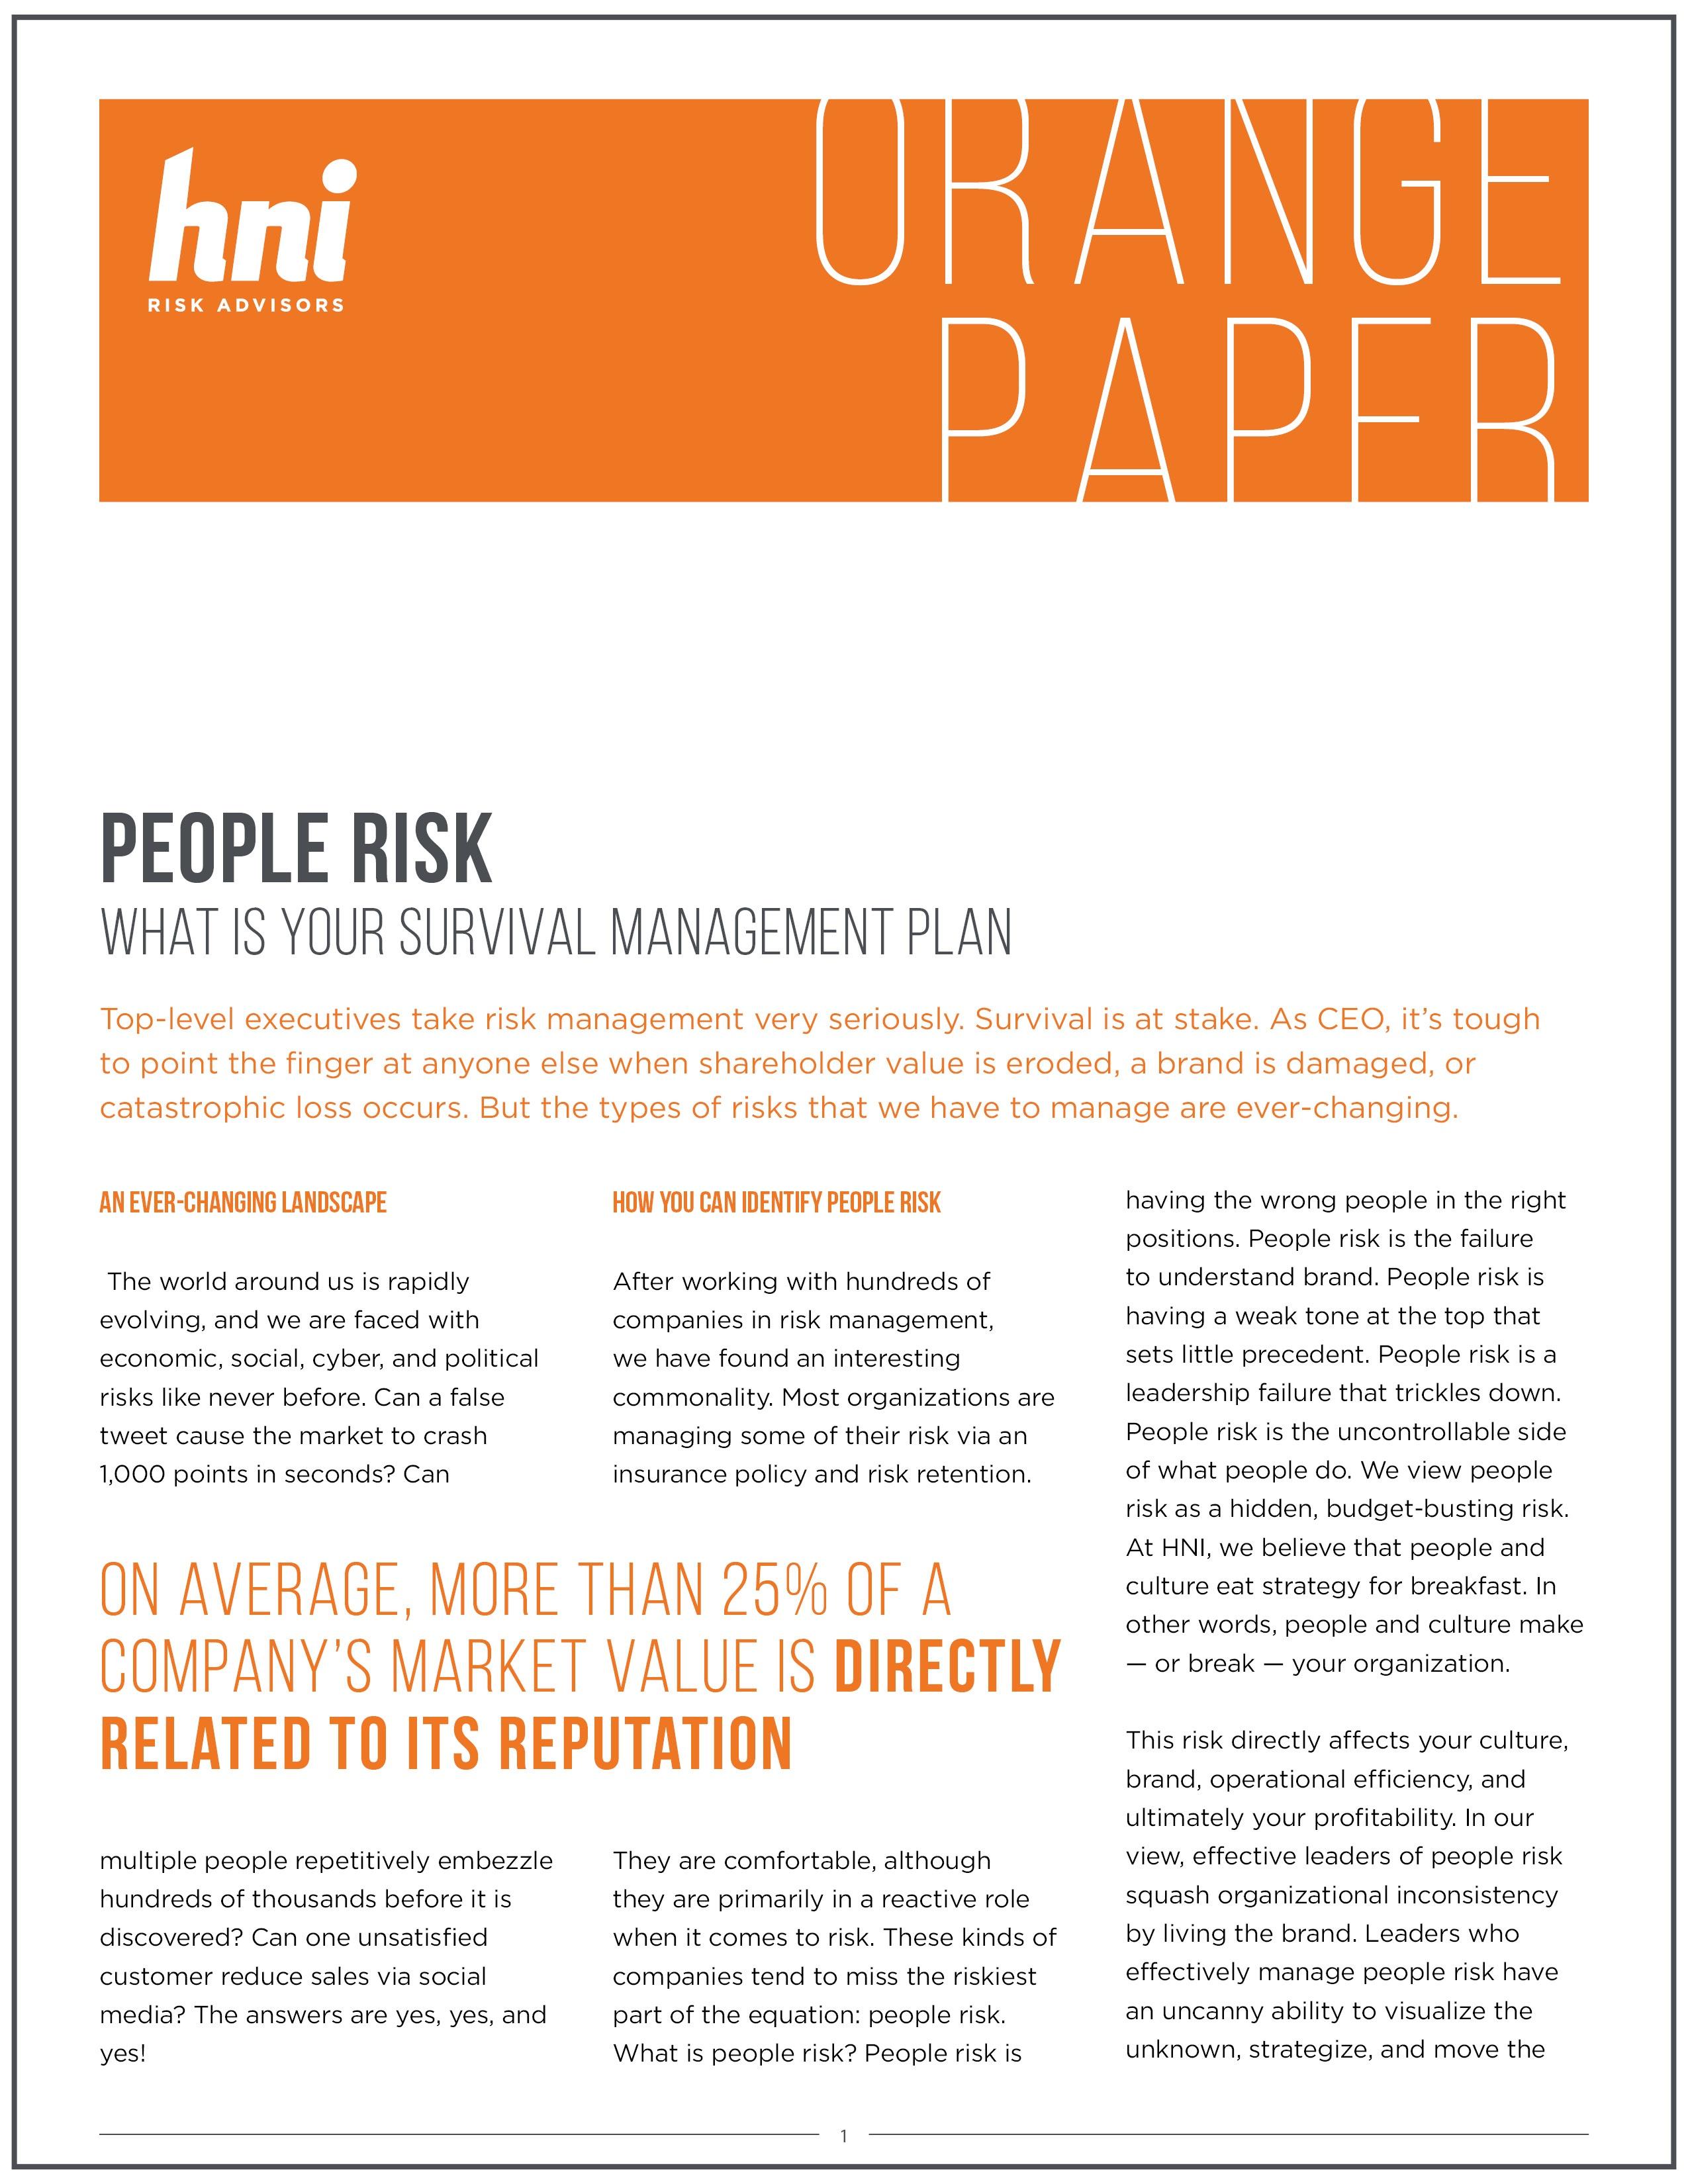 HNI_Orange Paper_People Risk-1.jpg